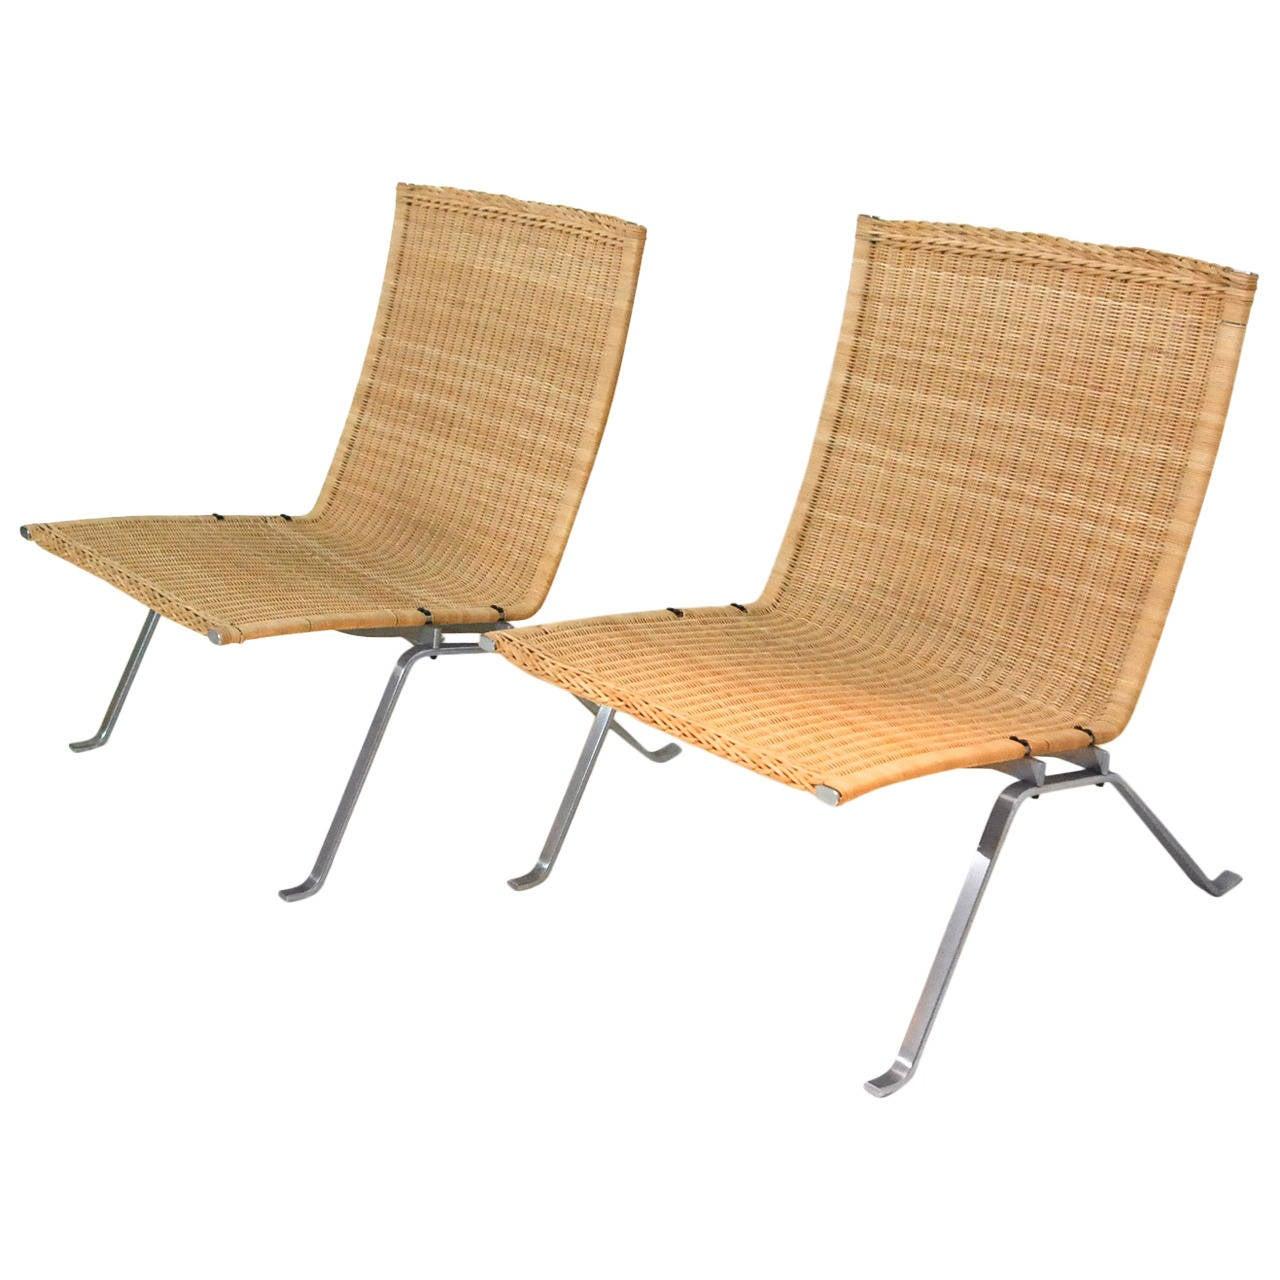 Poul Kjaerholm Pk22 Chairs At 1stdibs